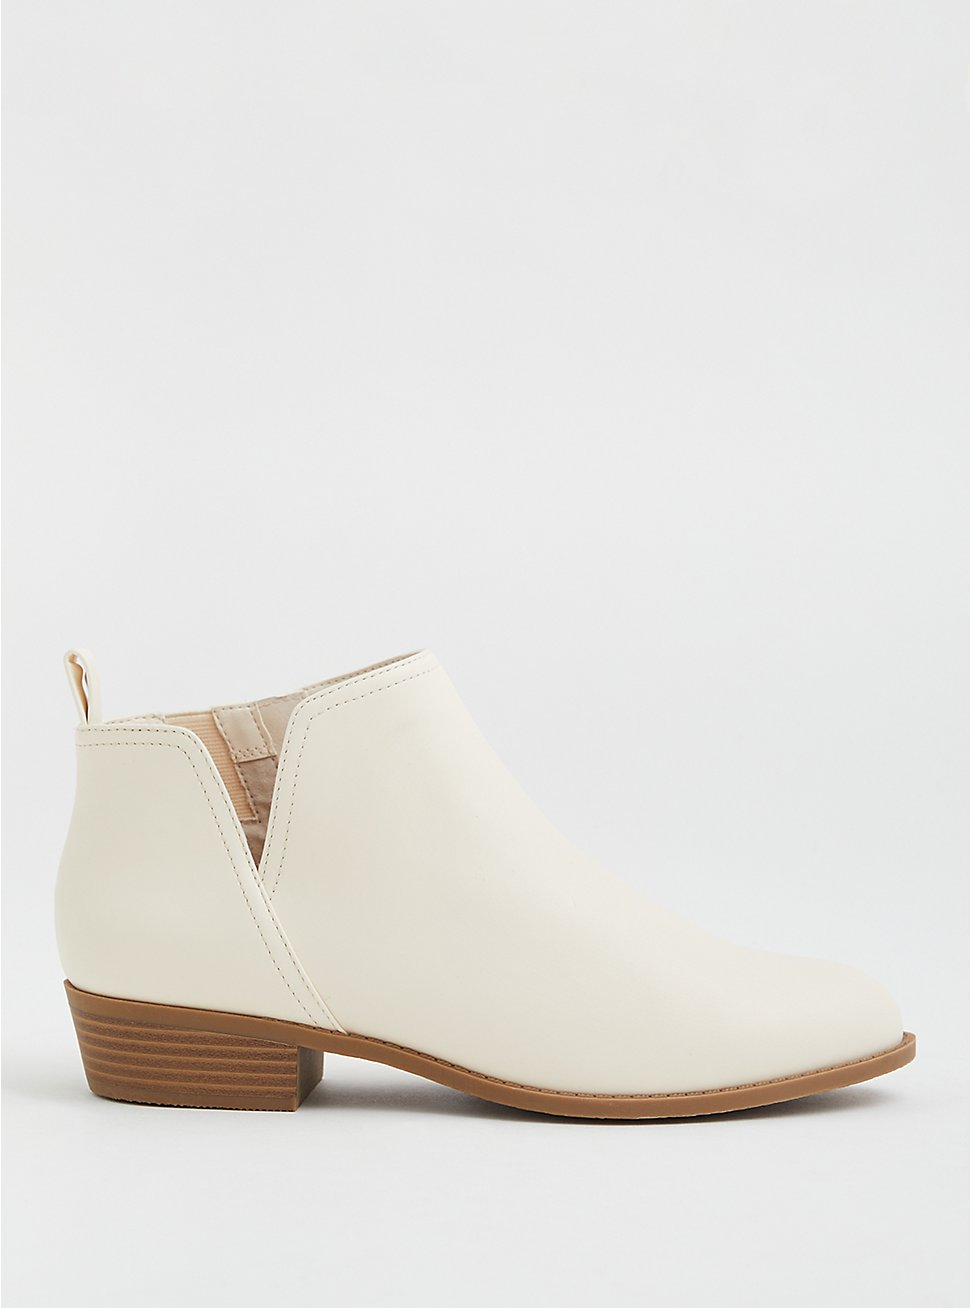 Beige Faux Leather V-Cut Ankle Bootie, BONE, hi-res